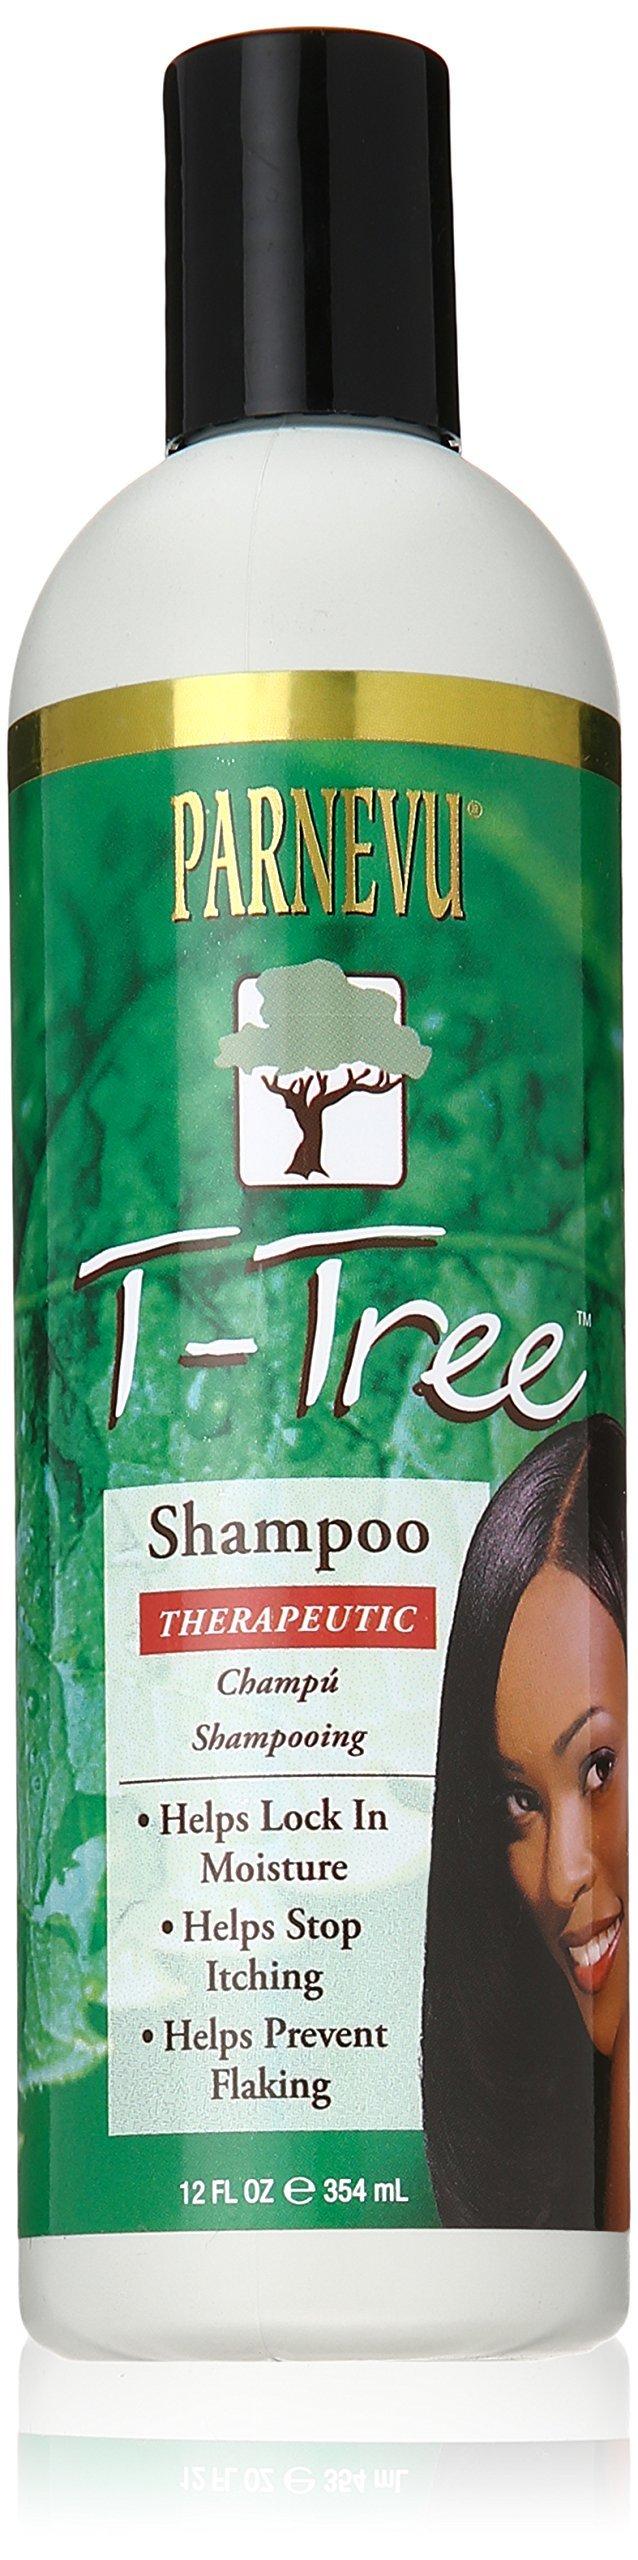 Parnevu T-Tree Therapeutic Shampoo, 12 Ounce